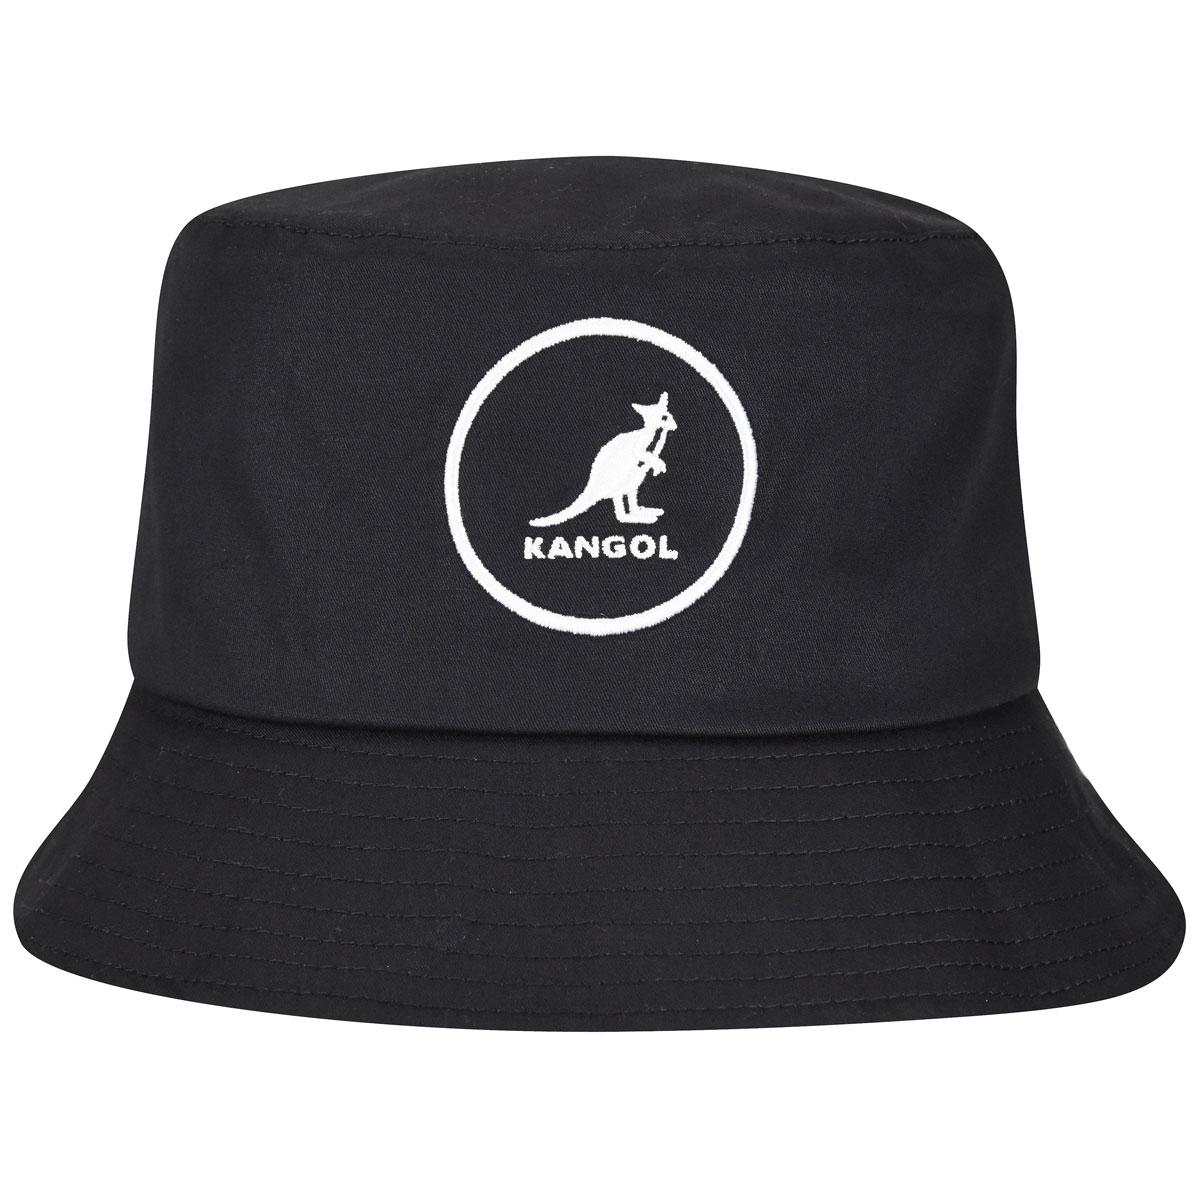 Kangol Cotton Bucket in Black